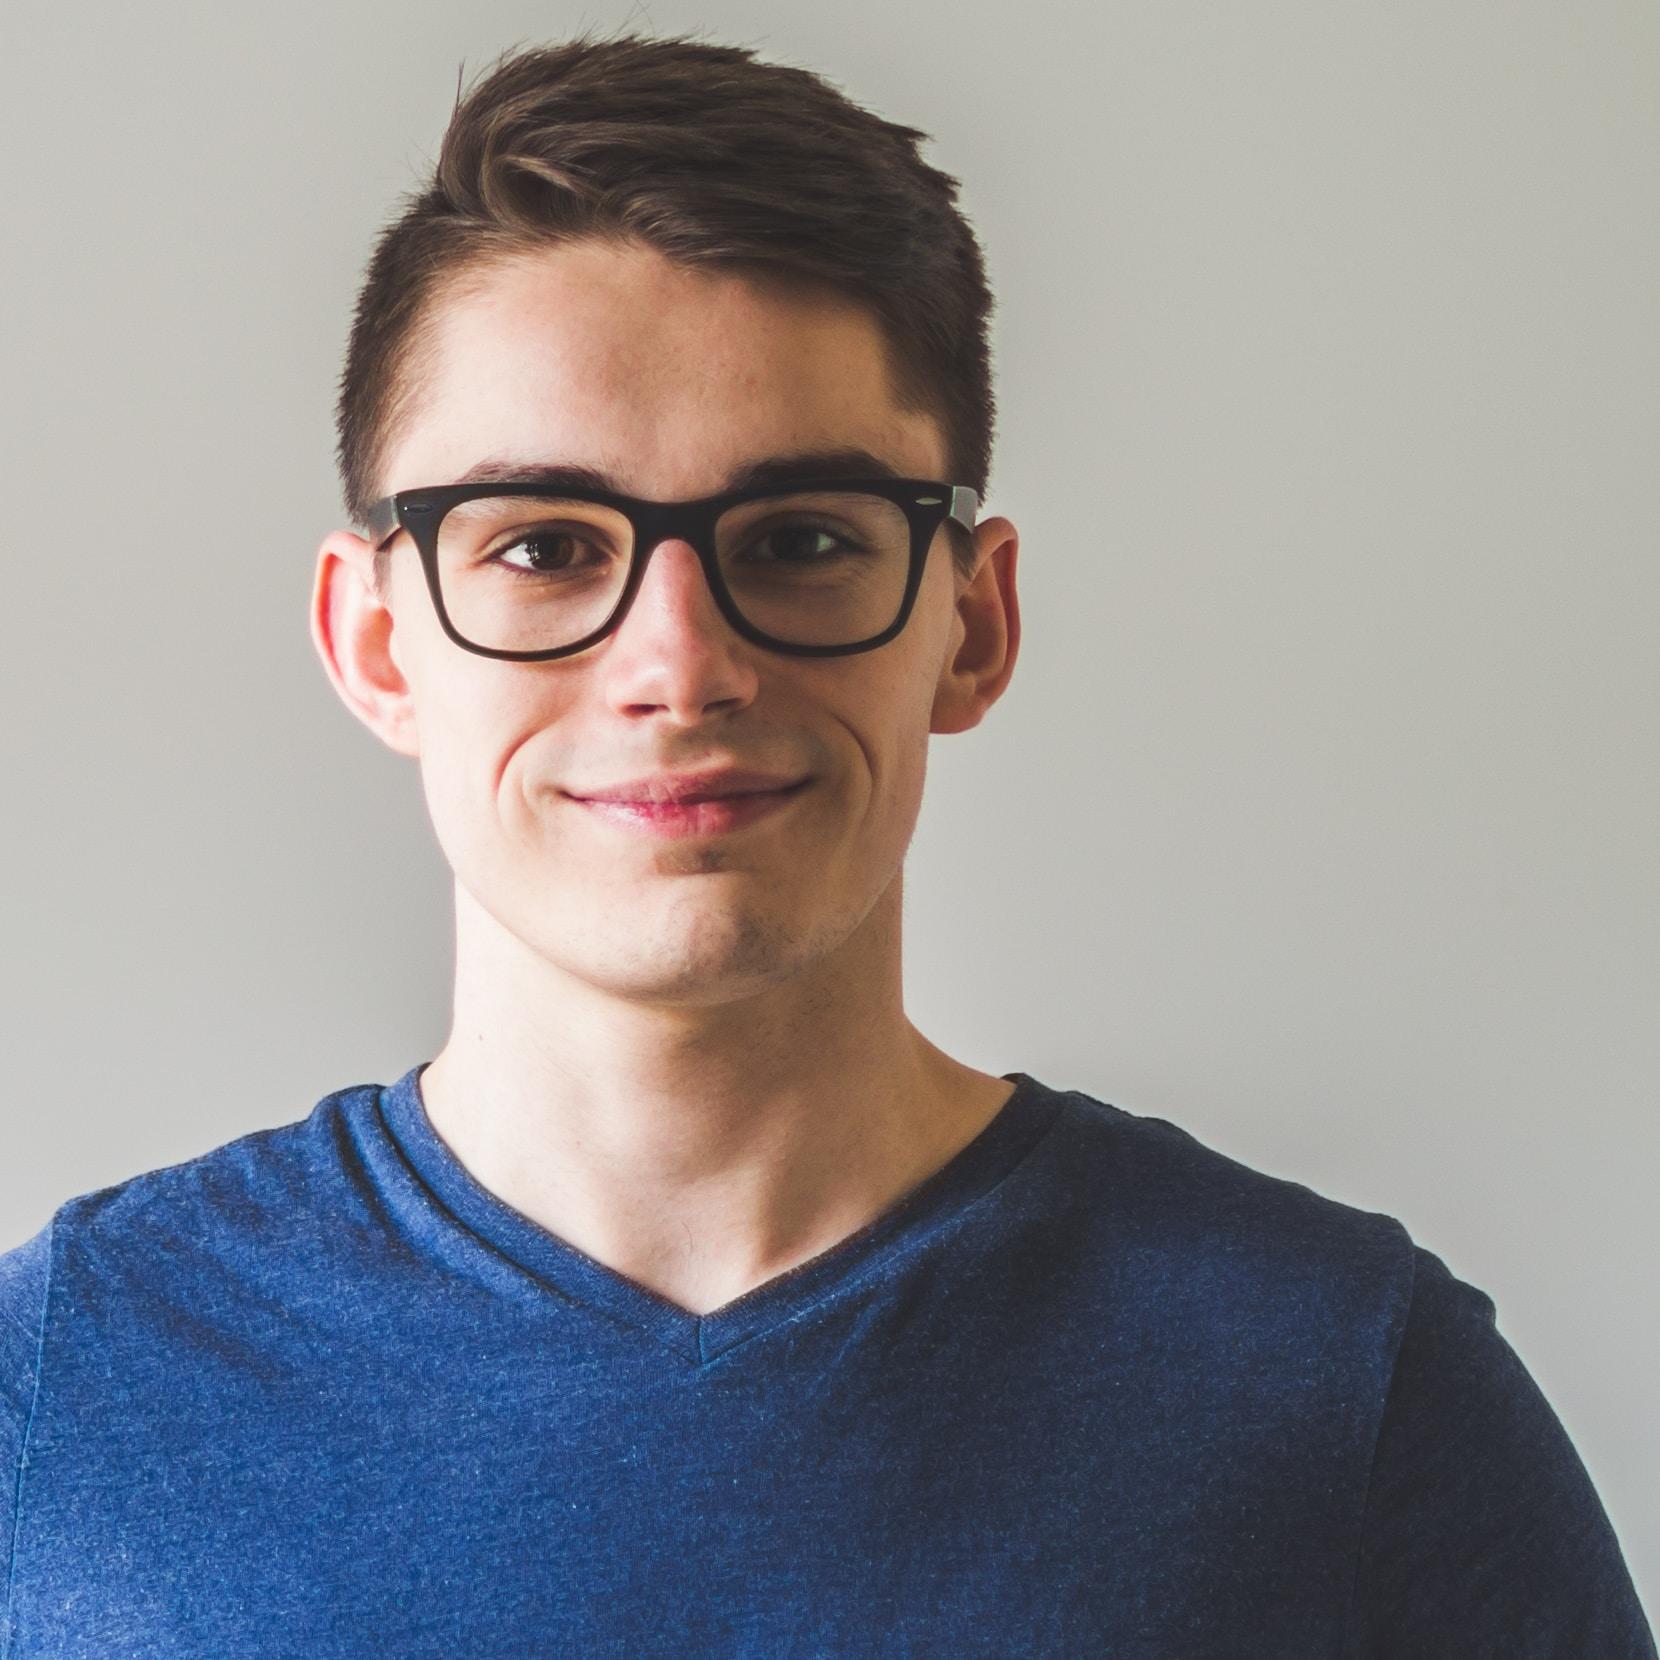 Avatar of user Martin Arusalu